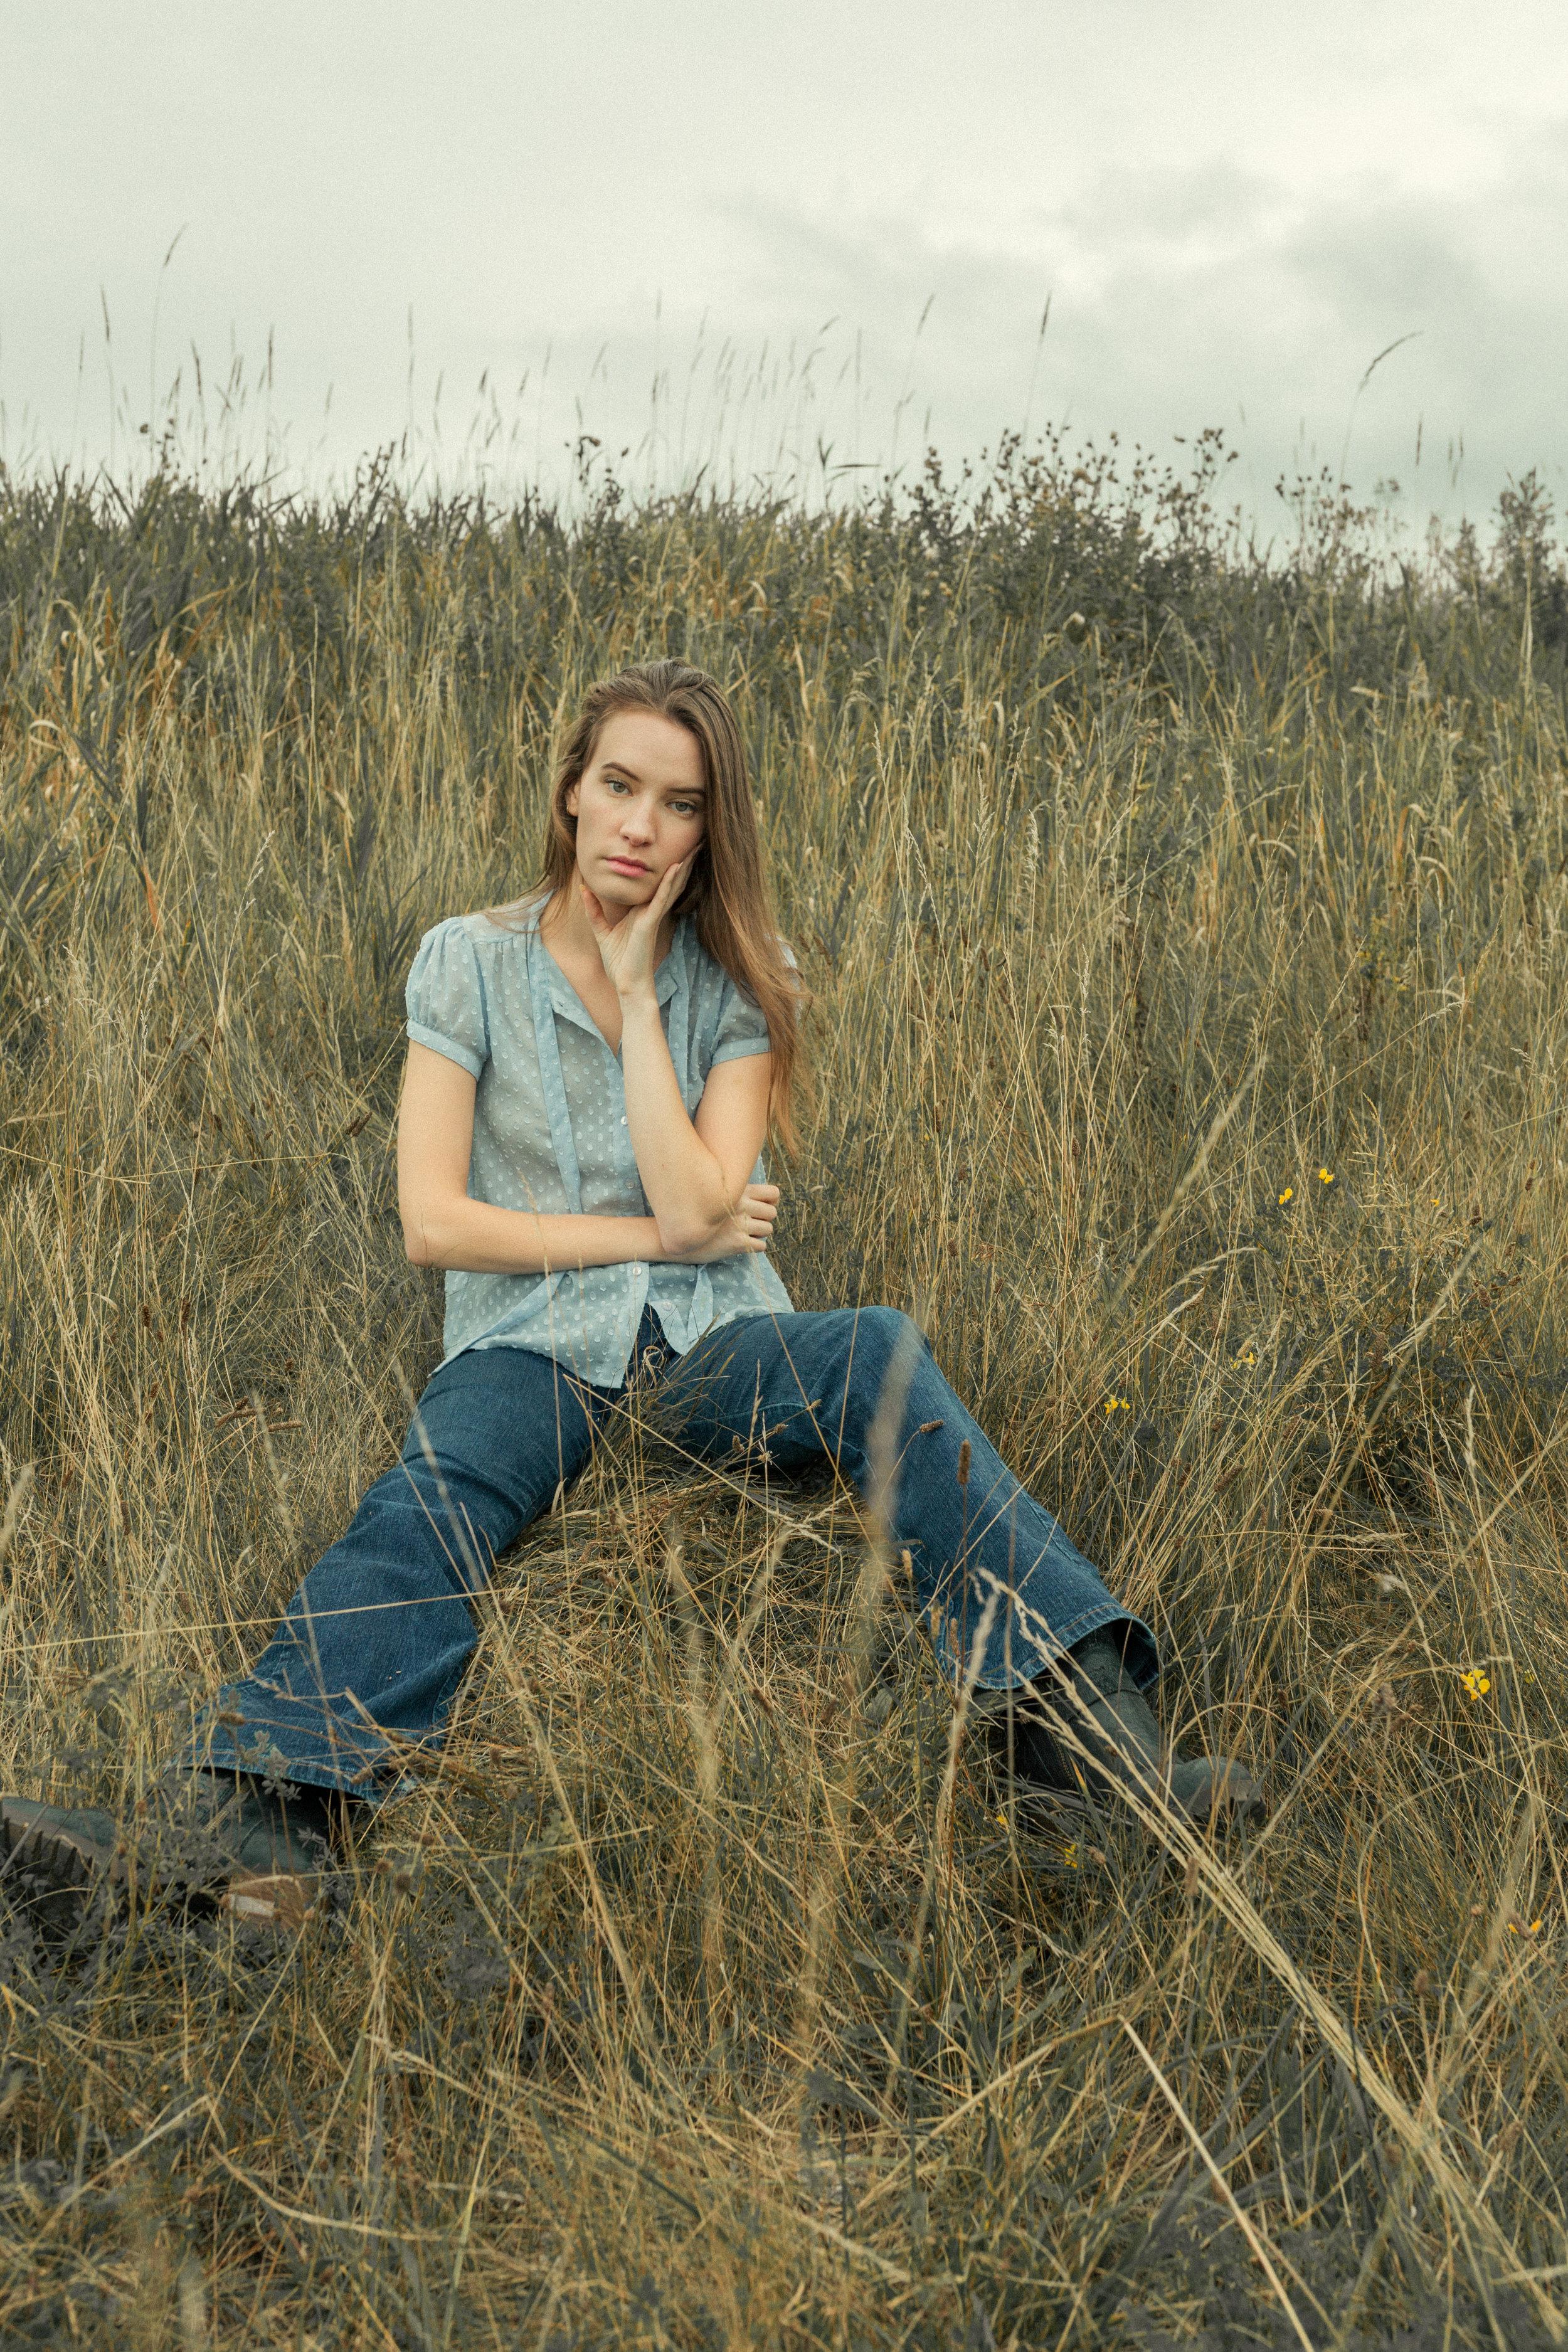 SofiaMaria_WinnieLu-24.jpg